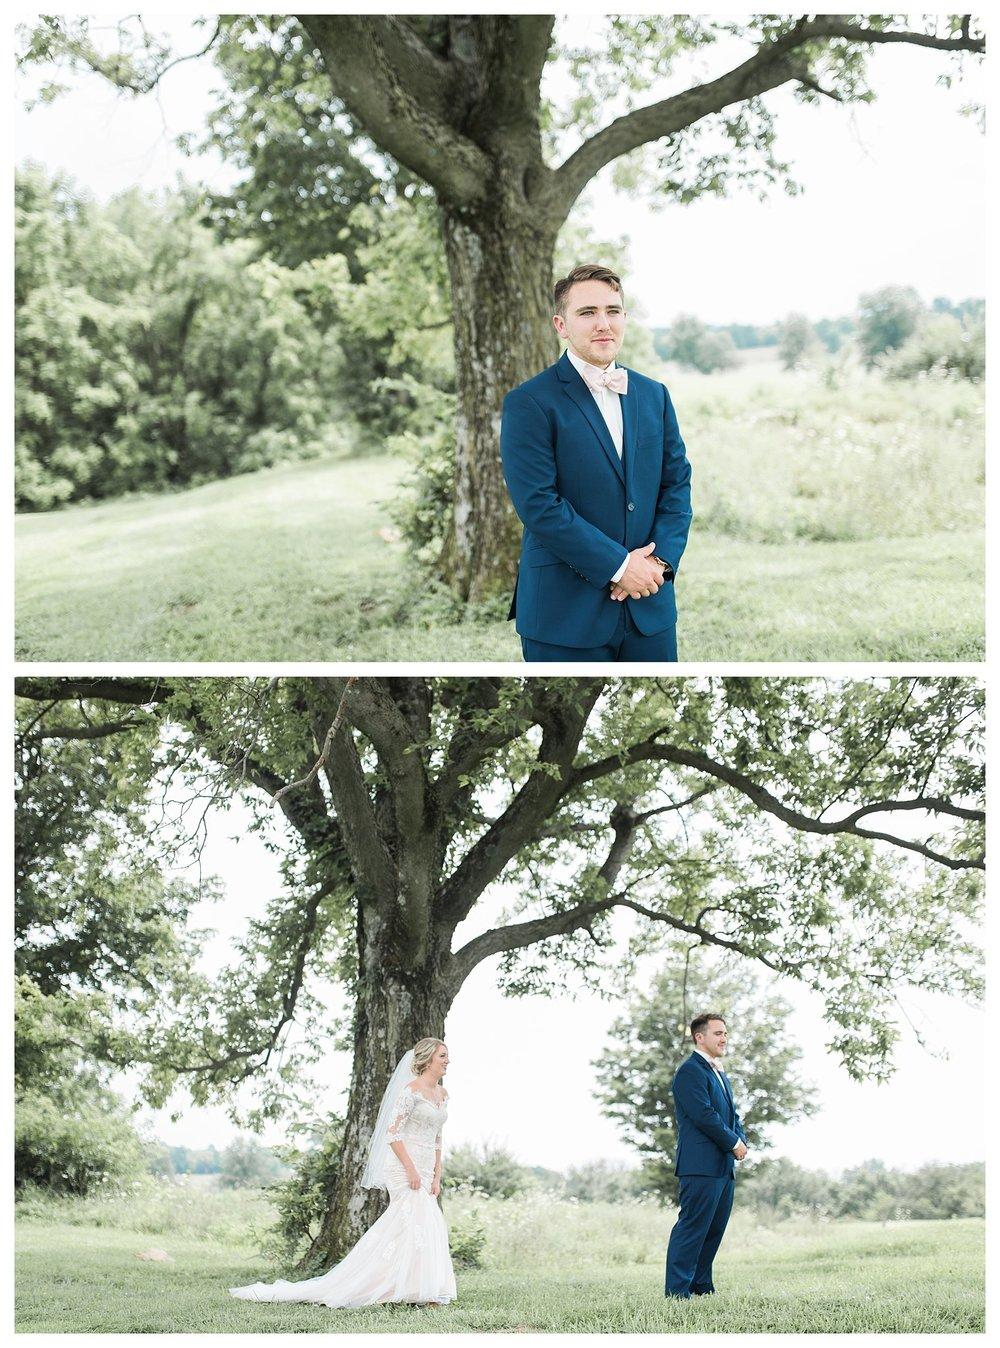 tower-park-mess-hall-everleigh-photography-northern-kentucky-wedding-photographer-09